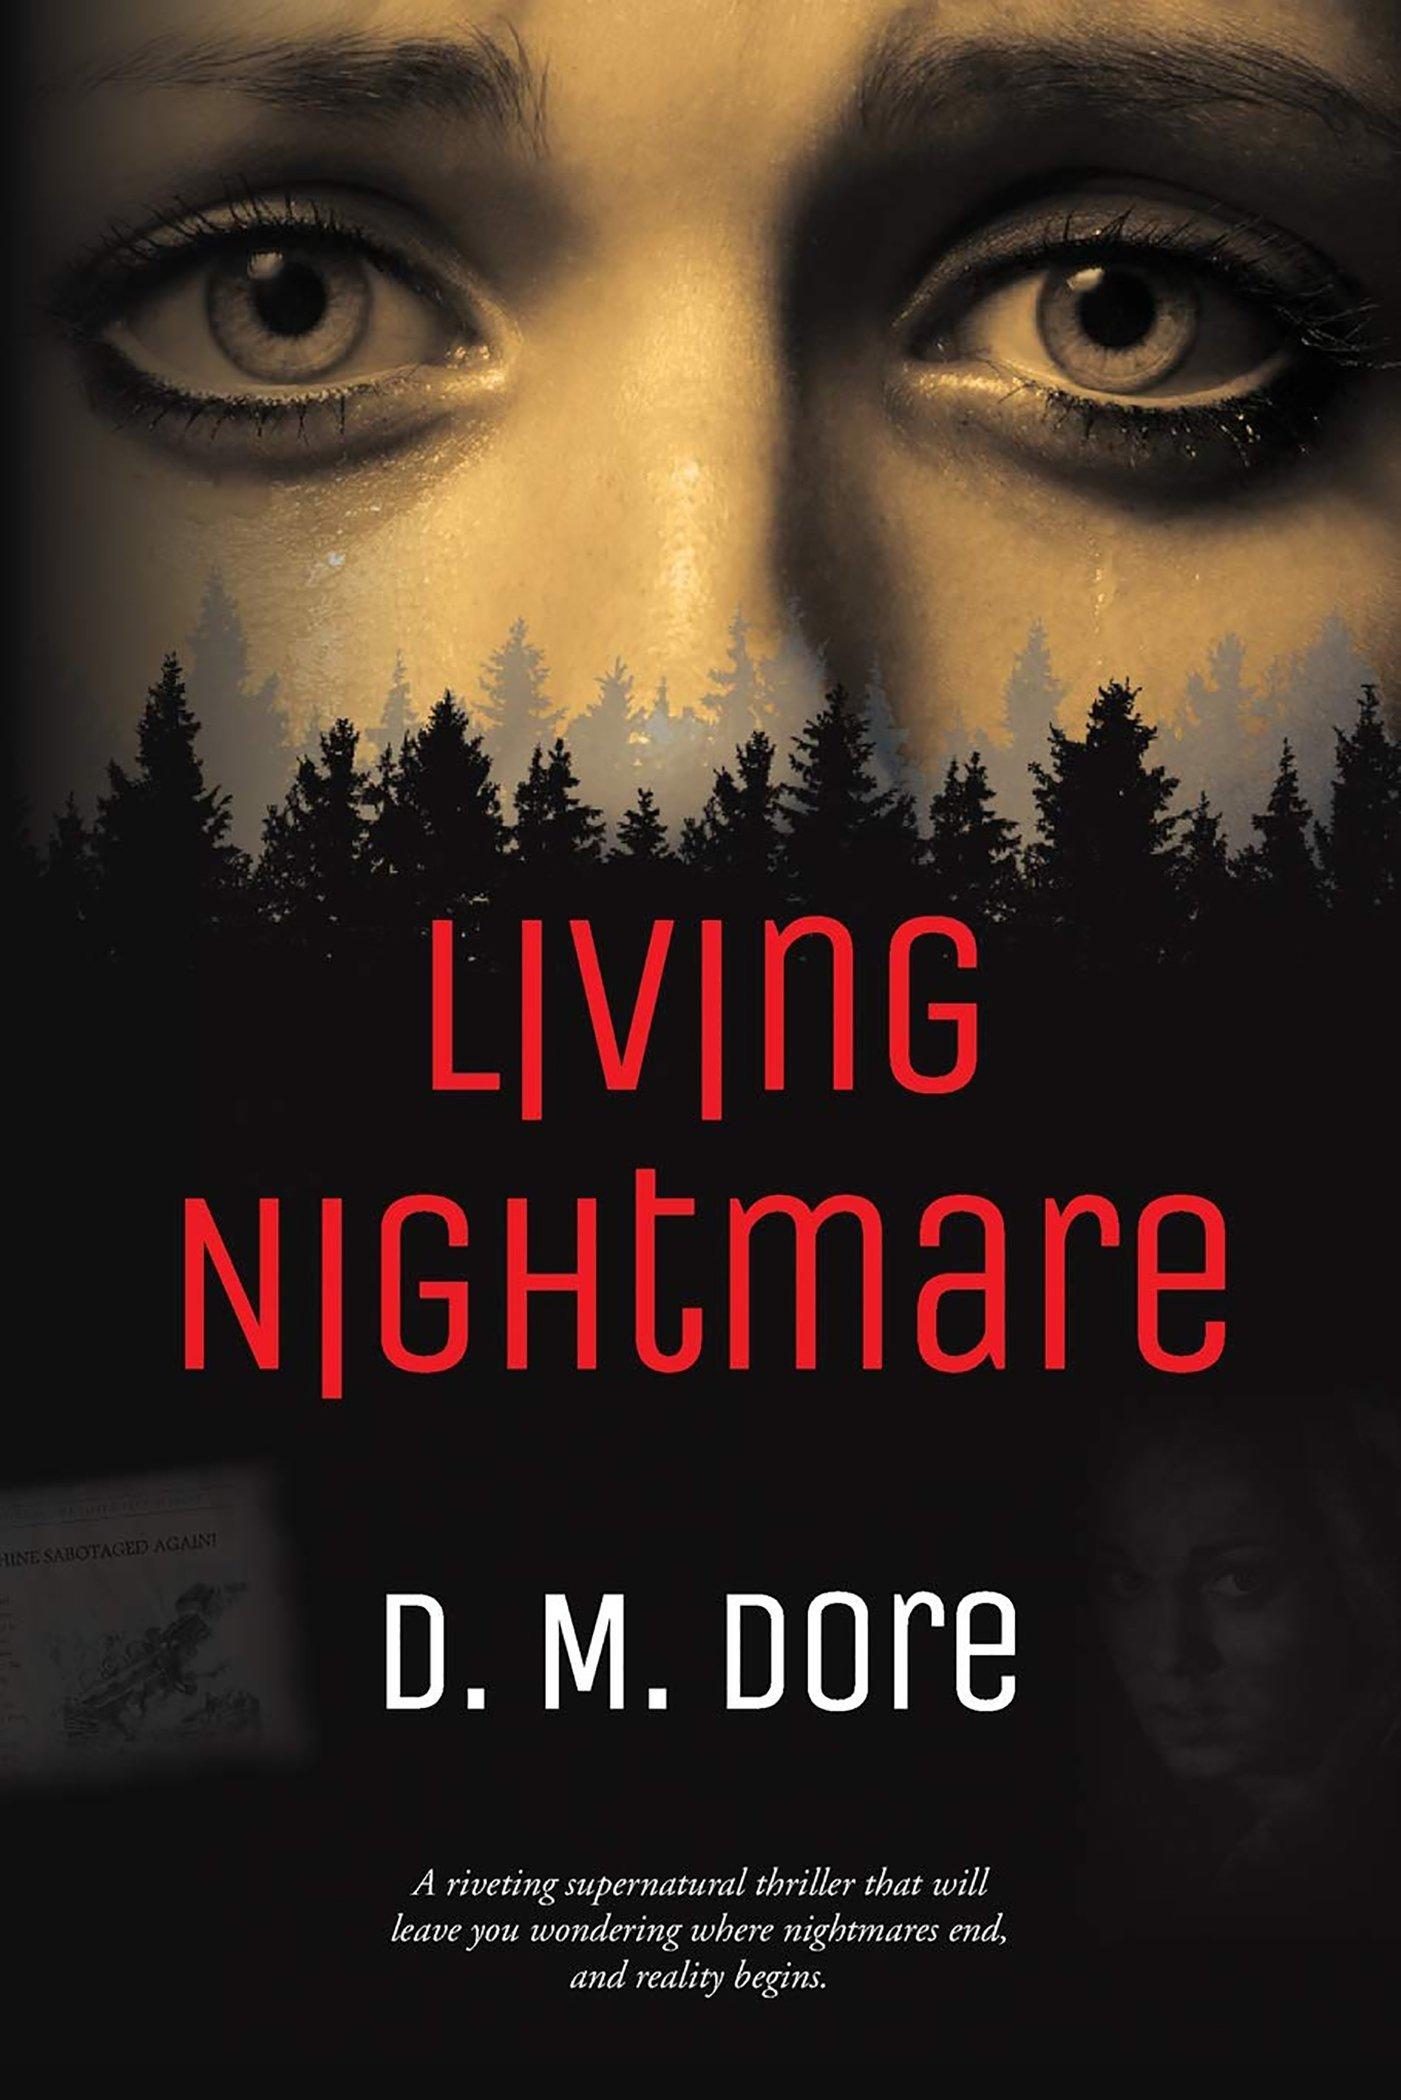 D. M. Dore - Living Nightmare